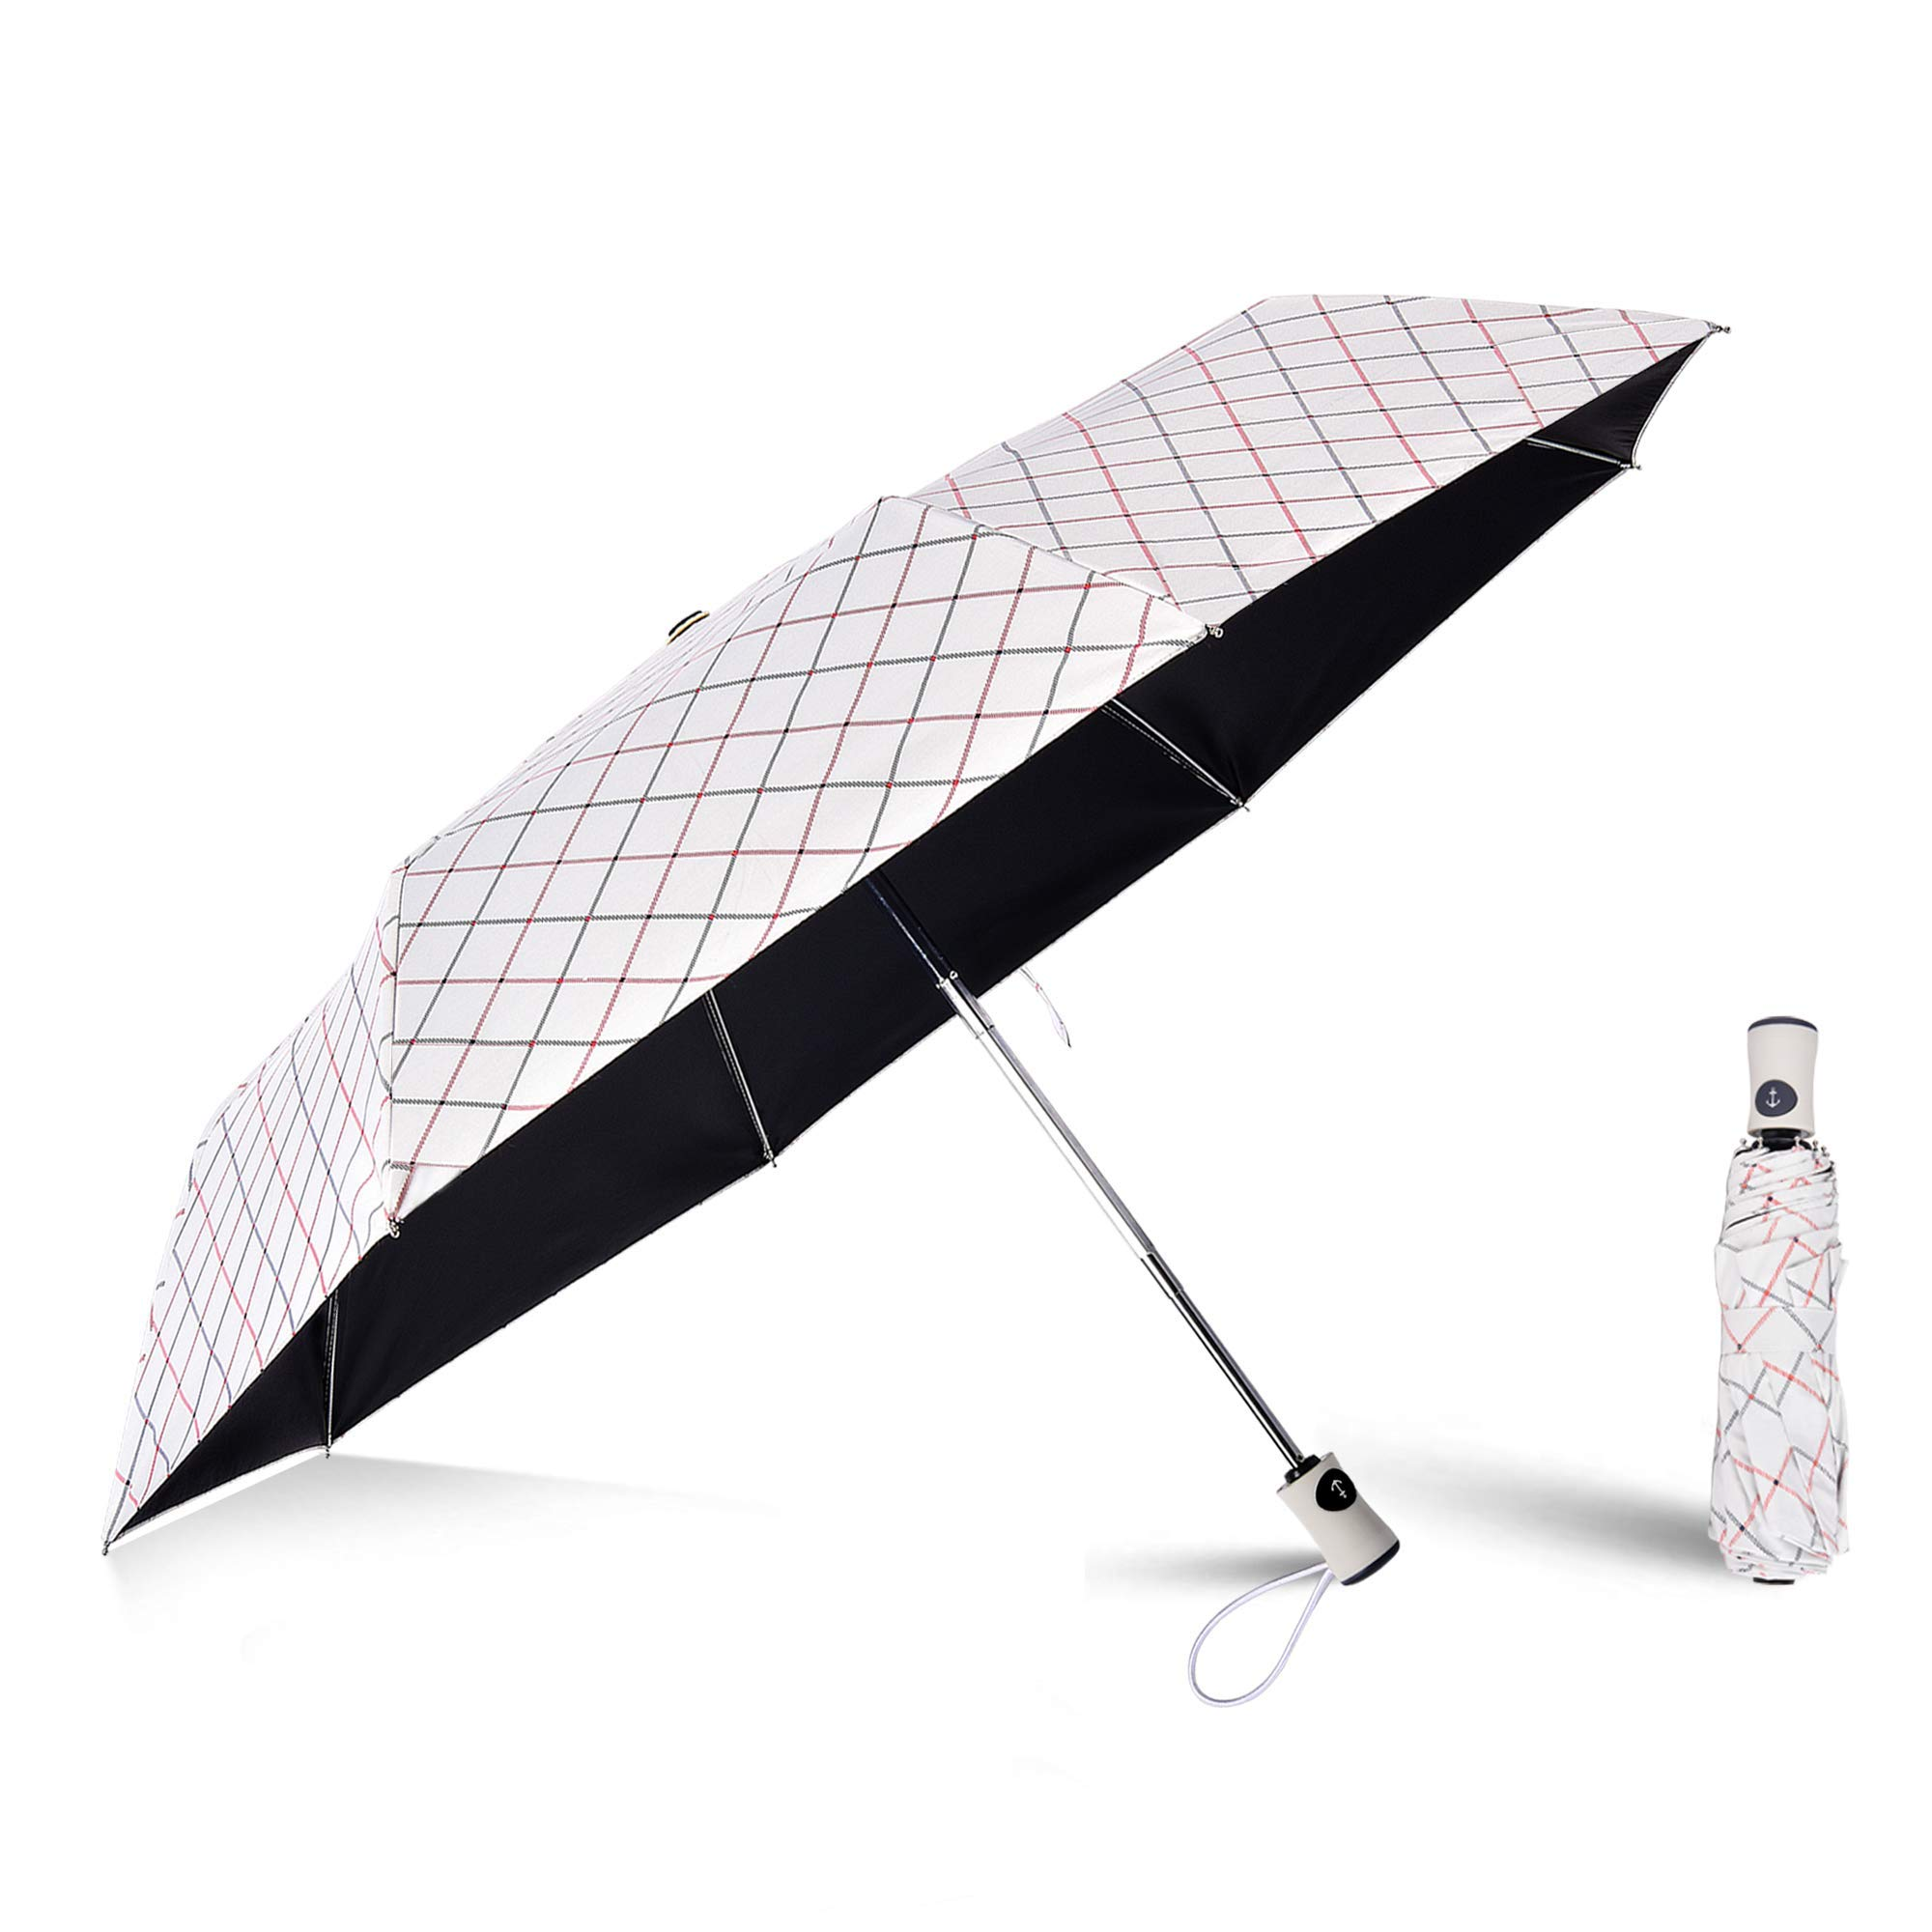 FILWO Handheld Sun Umbrella UV Protection, Automatic Travel Umbrella Compact Windproof, Folding Sun & Rain Umbrella 99% UV Protection Parasol with Anti-UV Coating